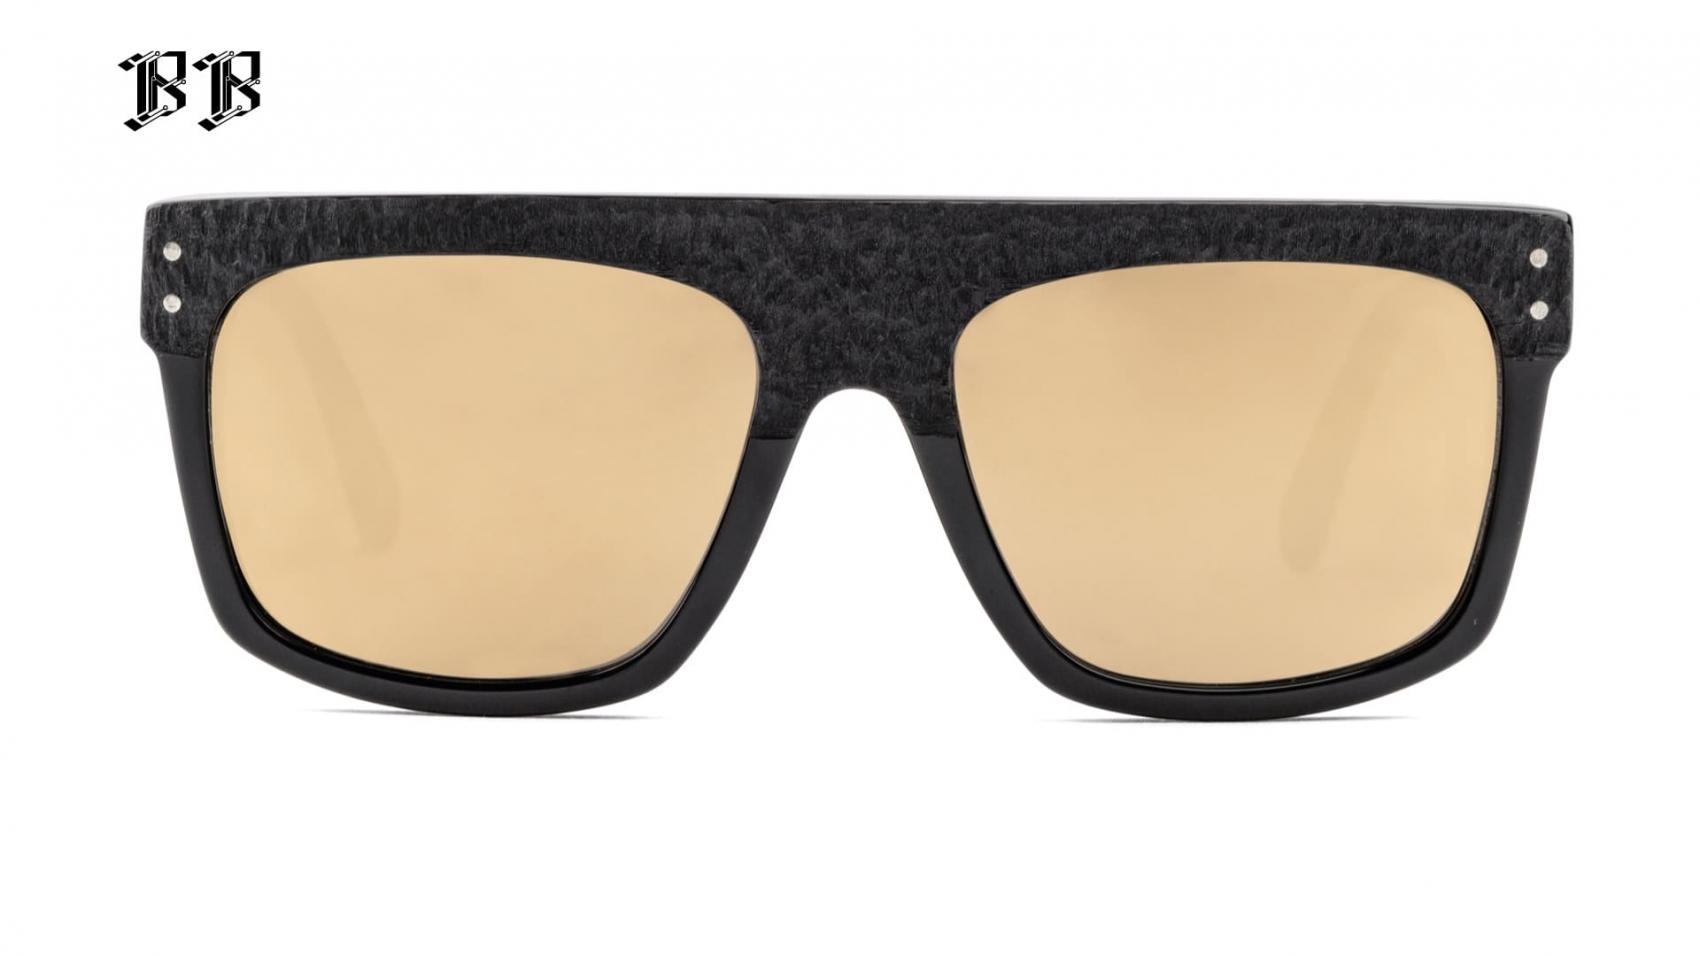 Sunglasses Raval Eyewear - Óptica Gran Vía Barcelona